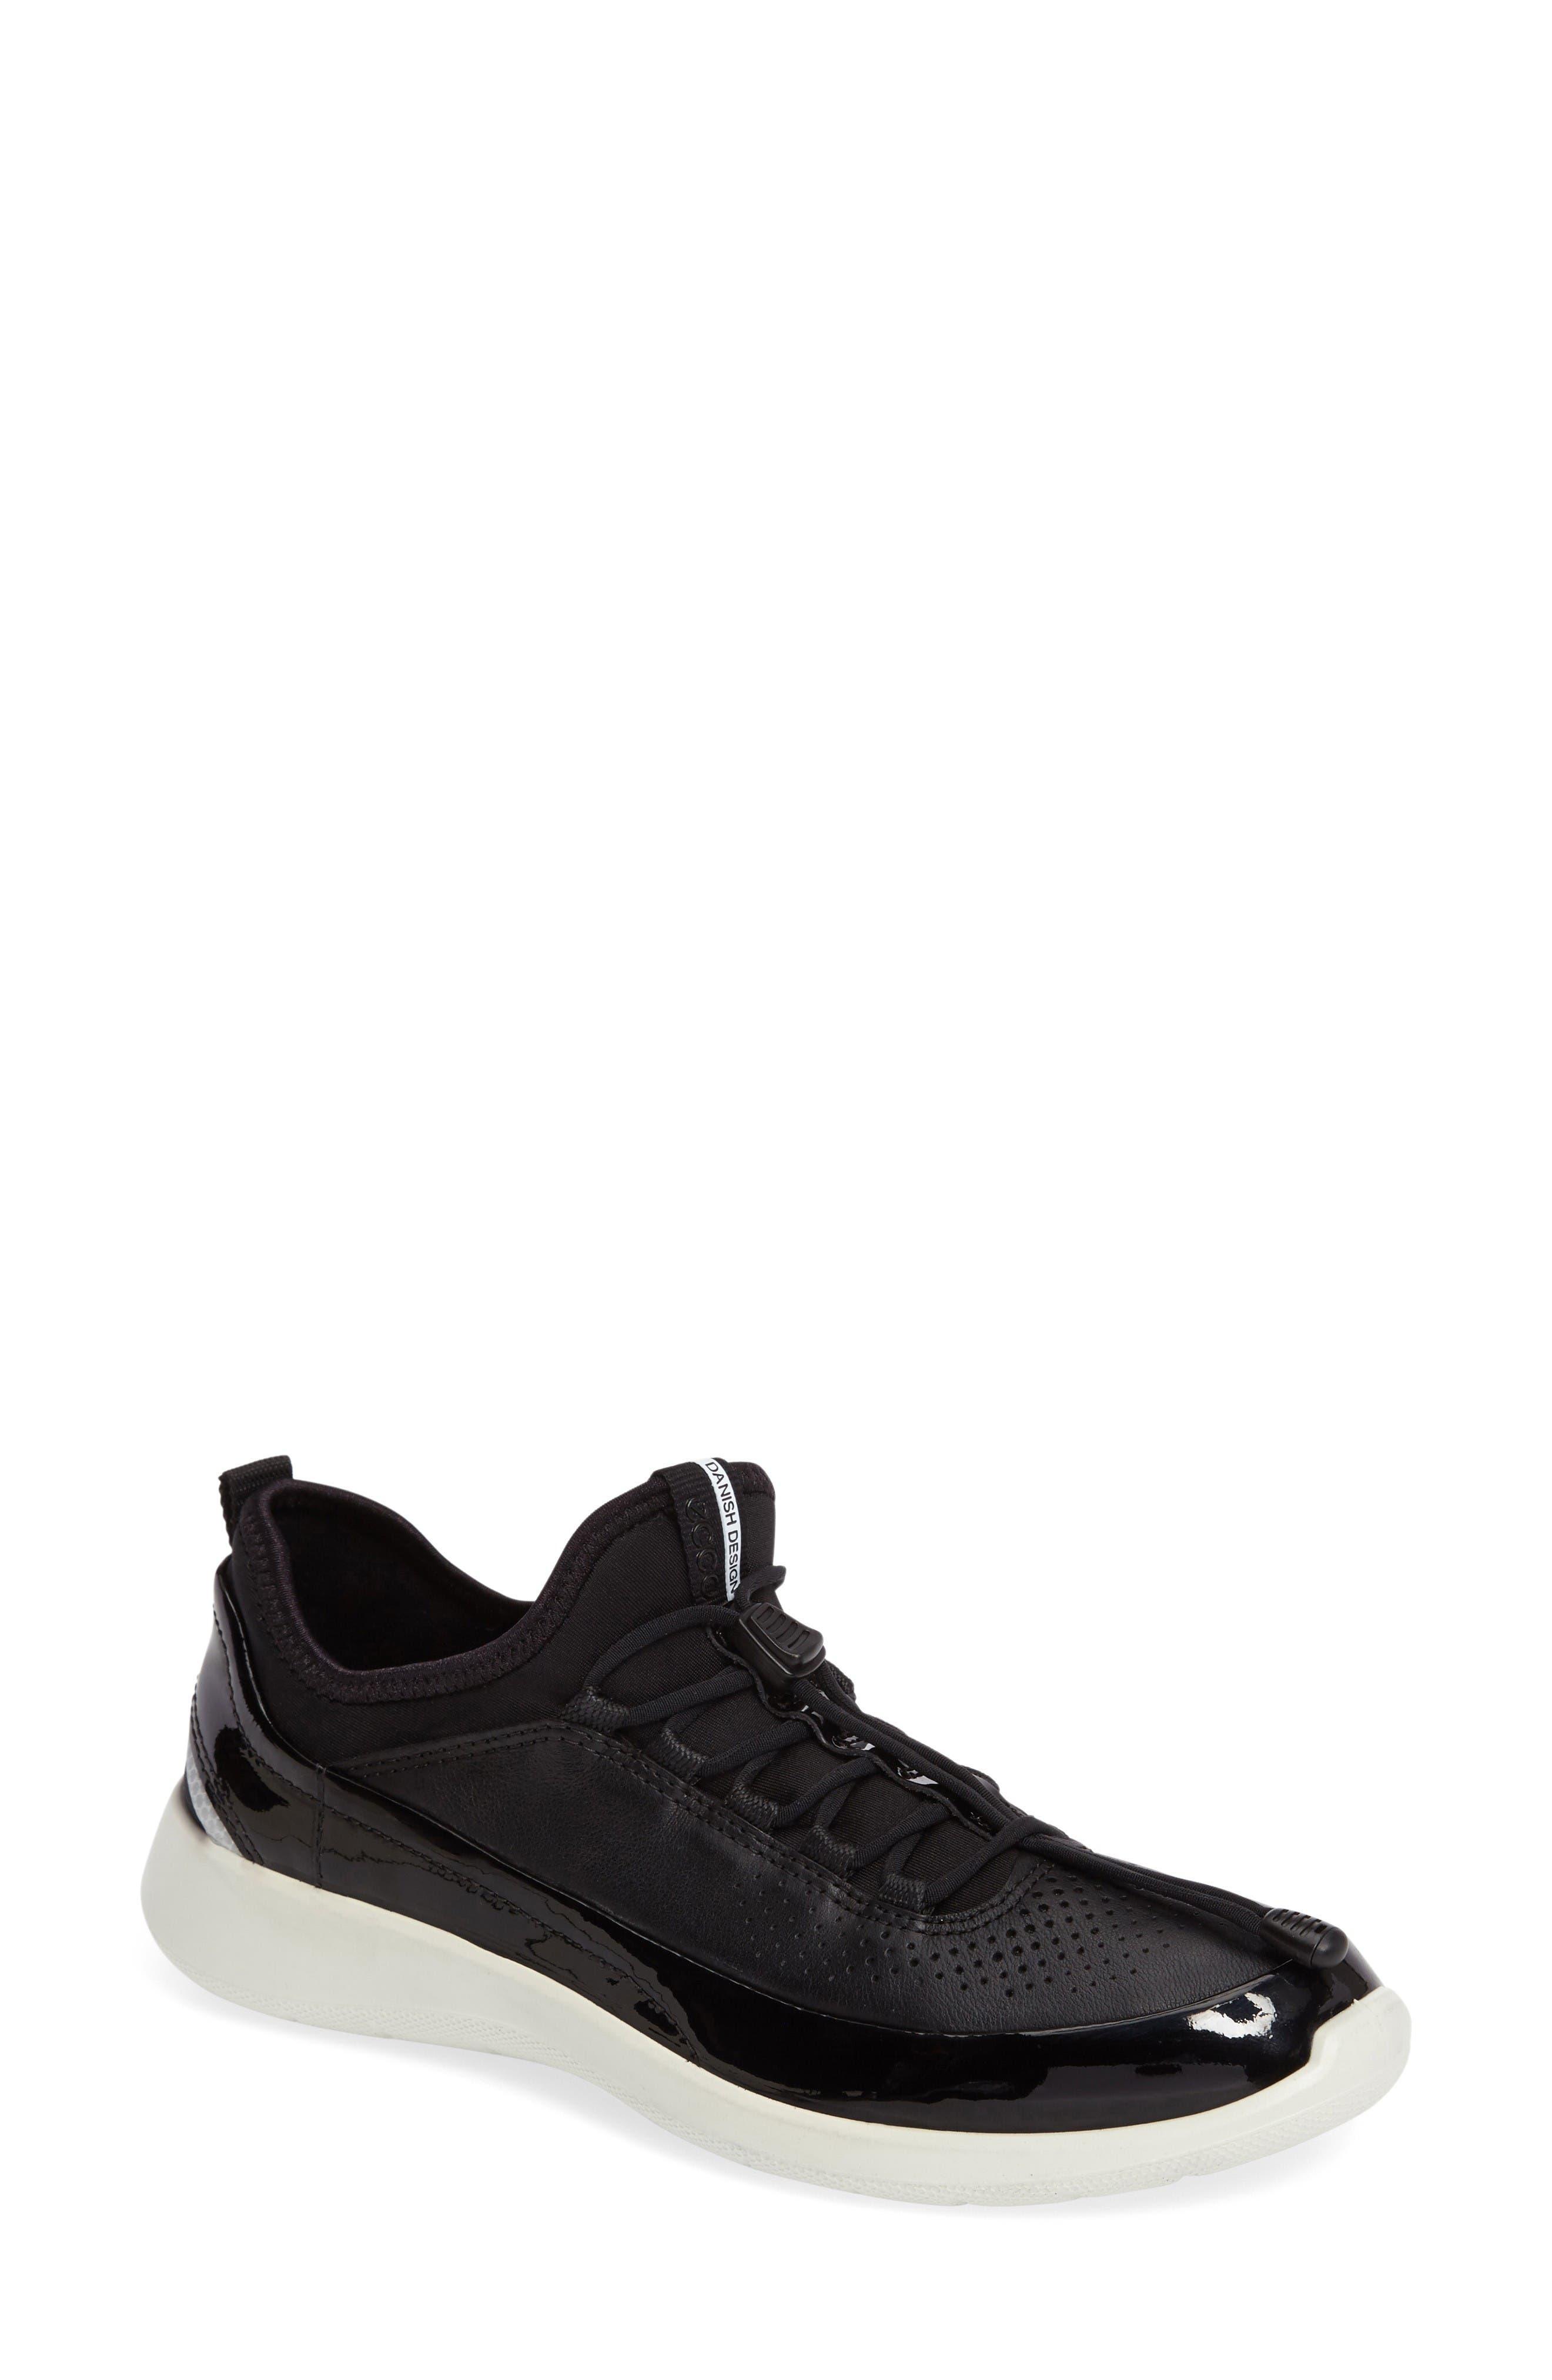 Soft 5 Sneaker,                             Main thumbnail 1, color,                             Black Leather